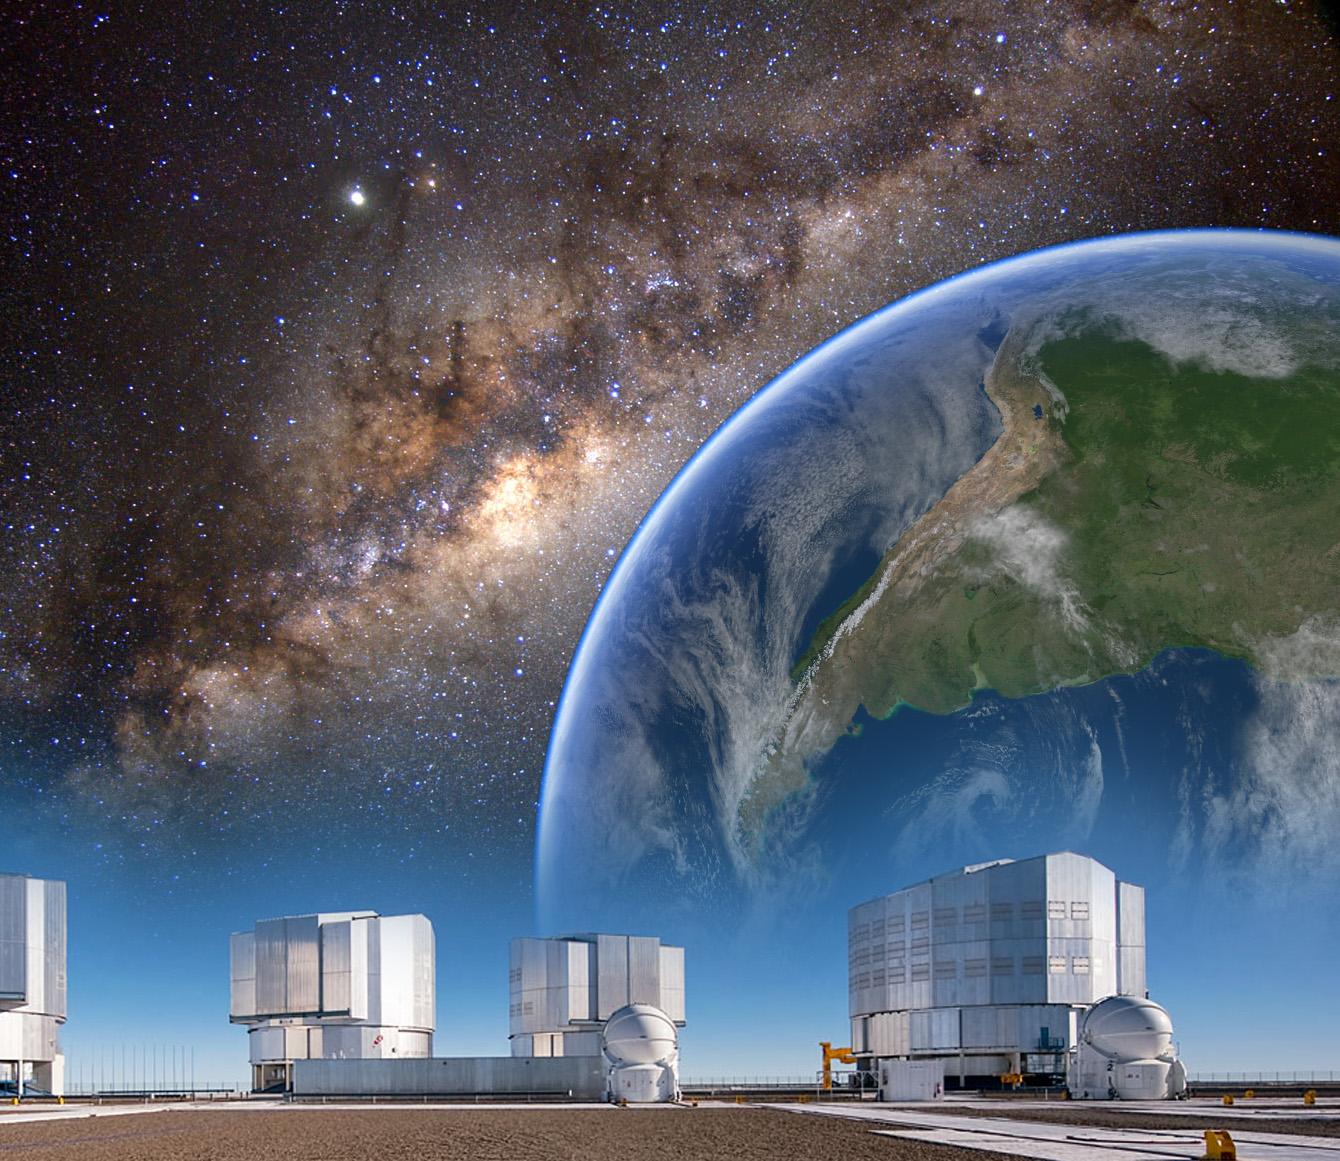 Bilddatei: Weltreise(C)LWL,Rienow+ESO.jpg